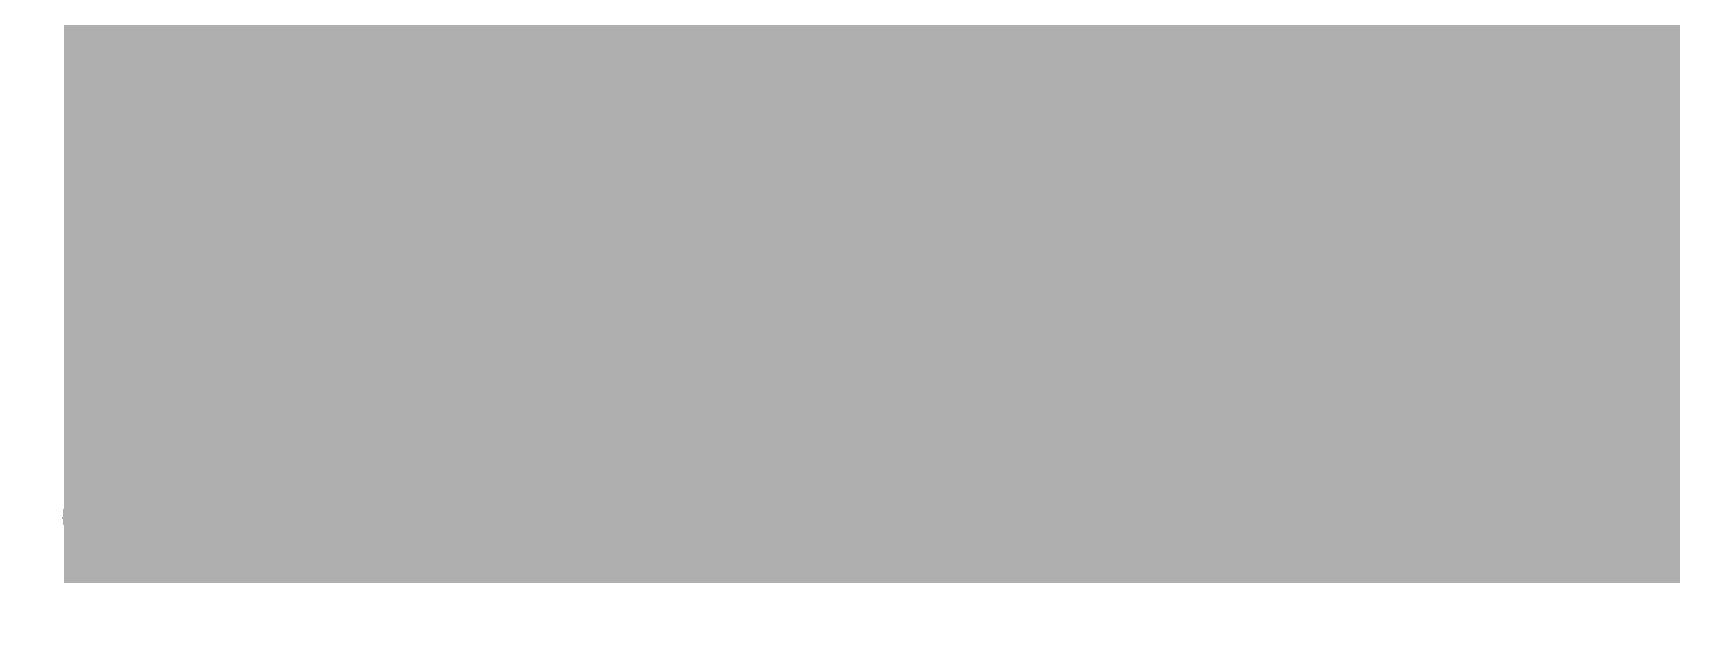 لوگوی دبیرستان سلام صادقیه